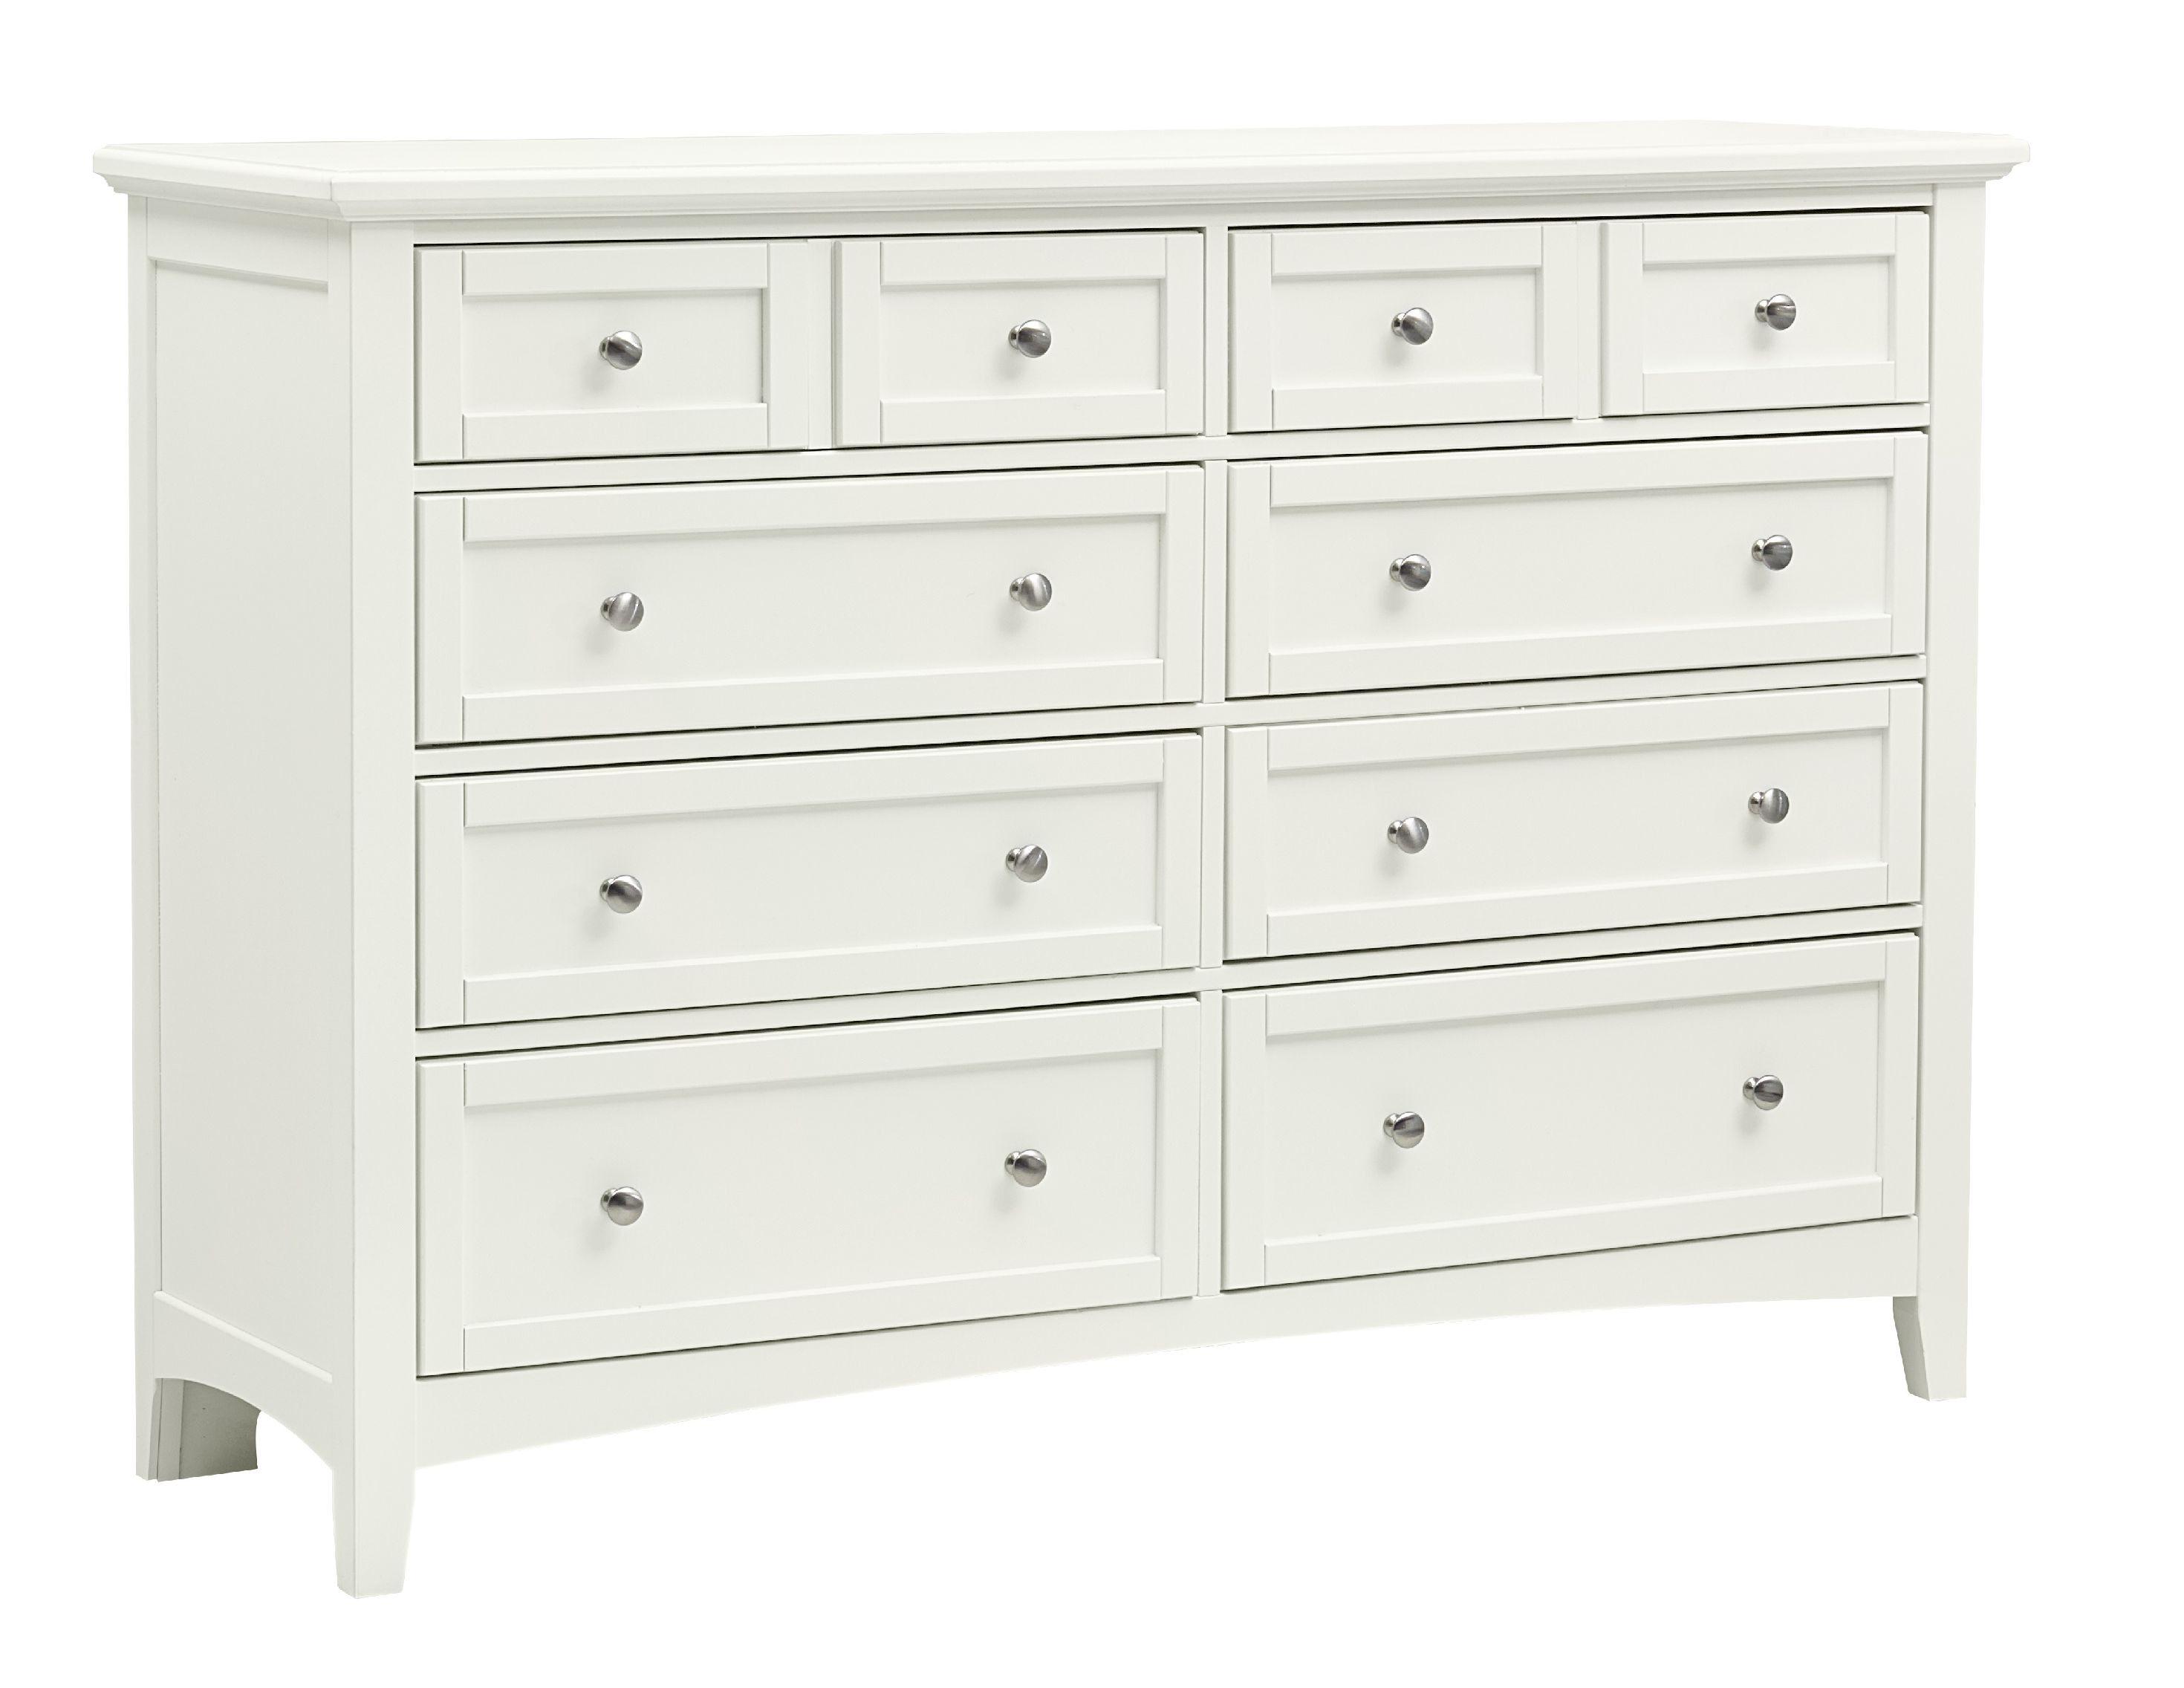 Vaughan Bassett Furniture Company Triple Dresser BB29 002